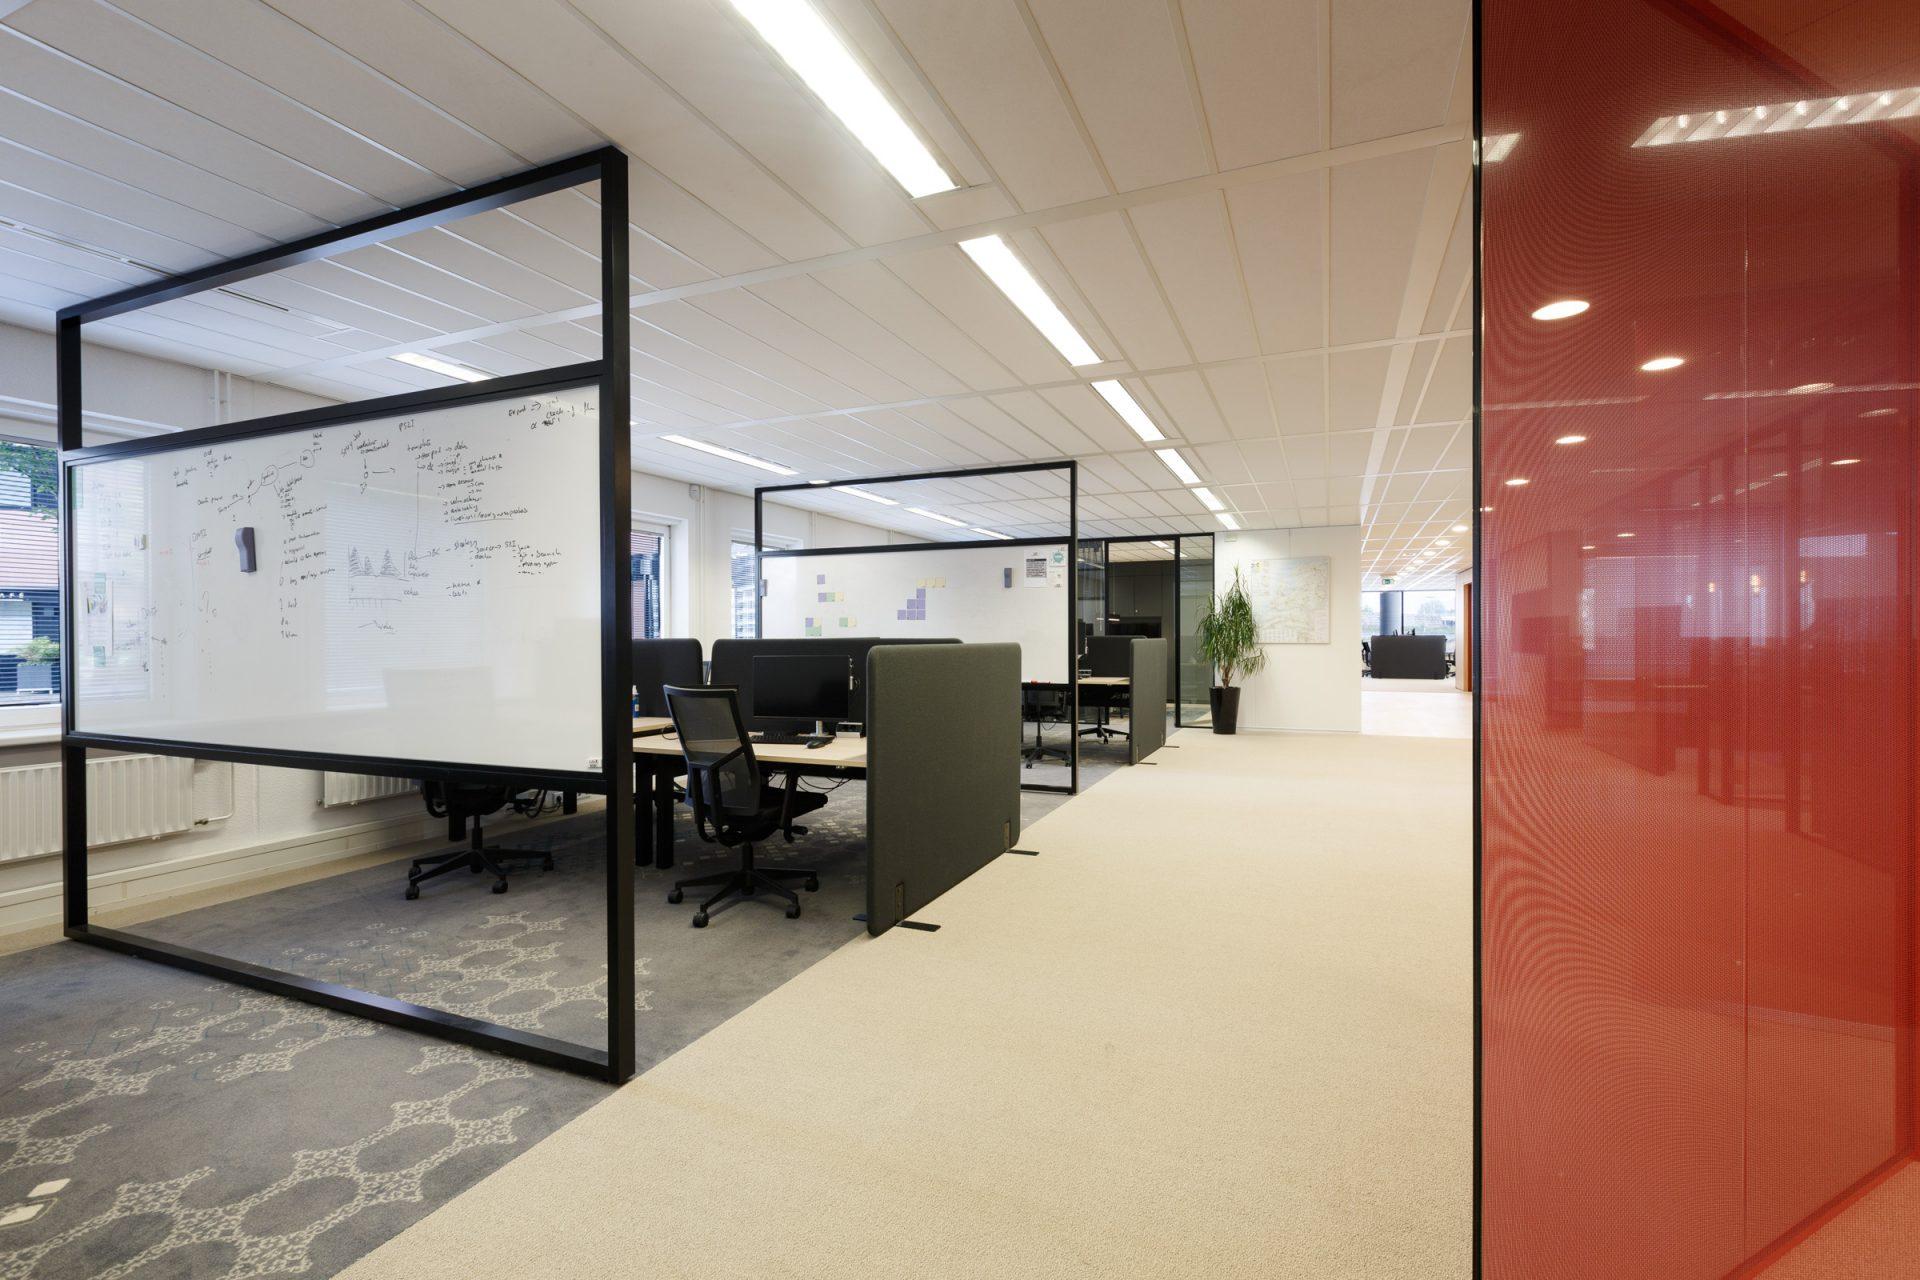 RubiX s-Hertogenbosch - Topperprojecten 3